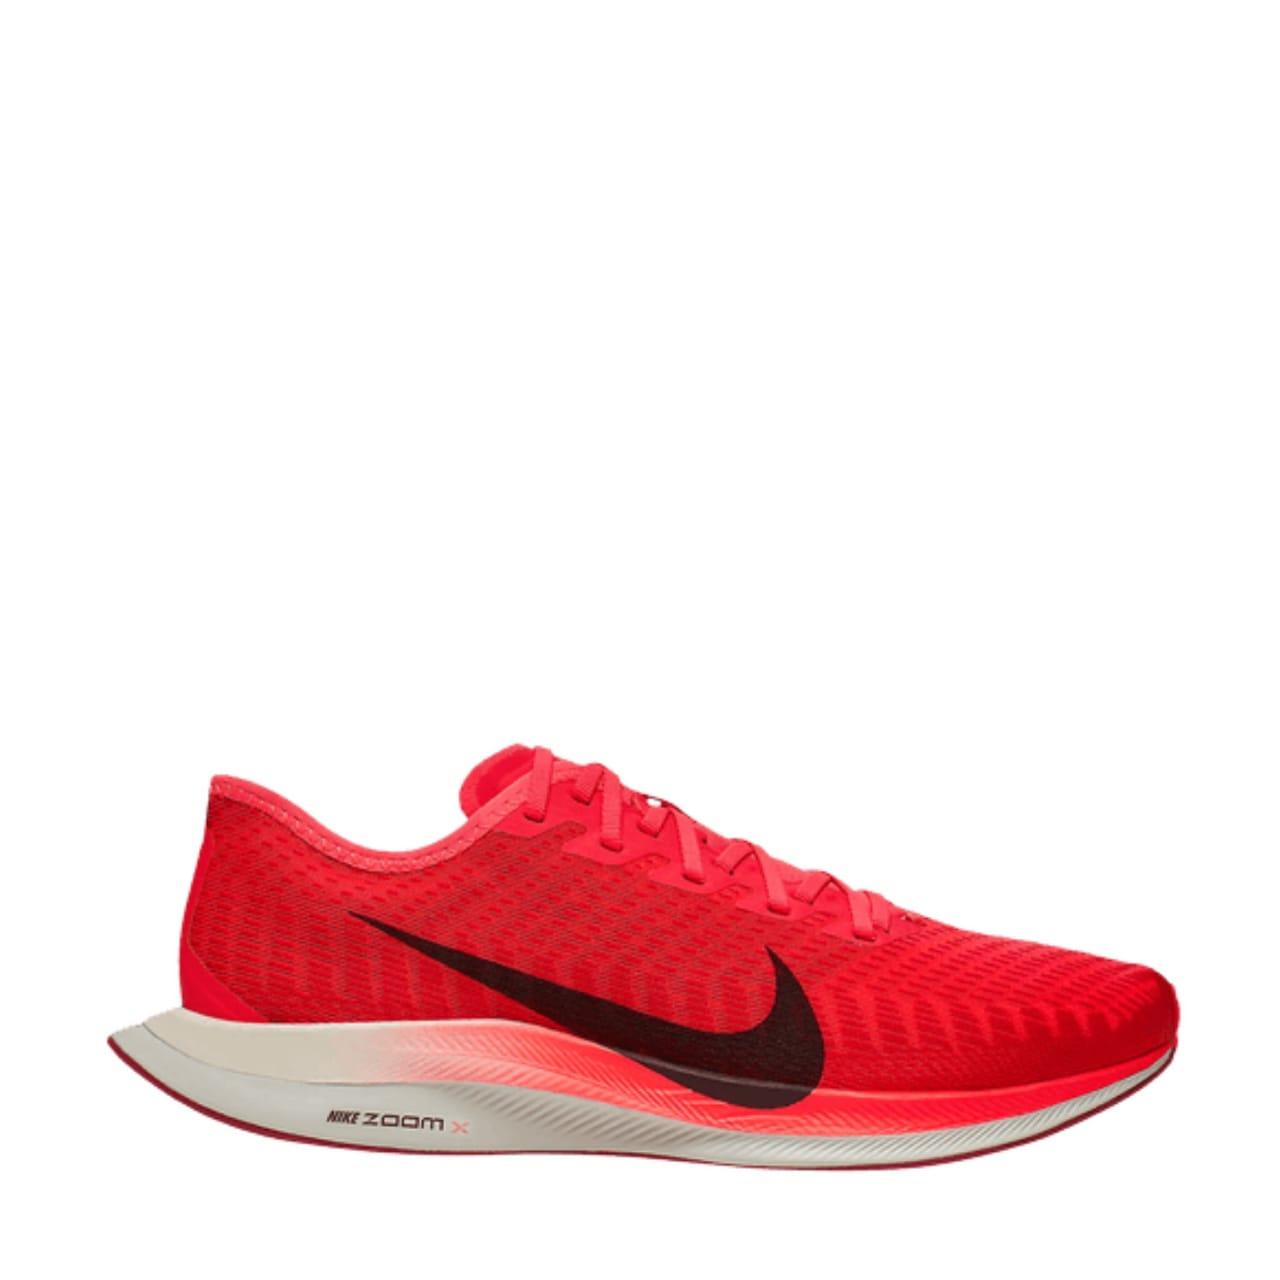 Nike Zoom Pegasus Turbo 2 'Bright Crimson'